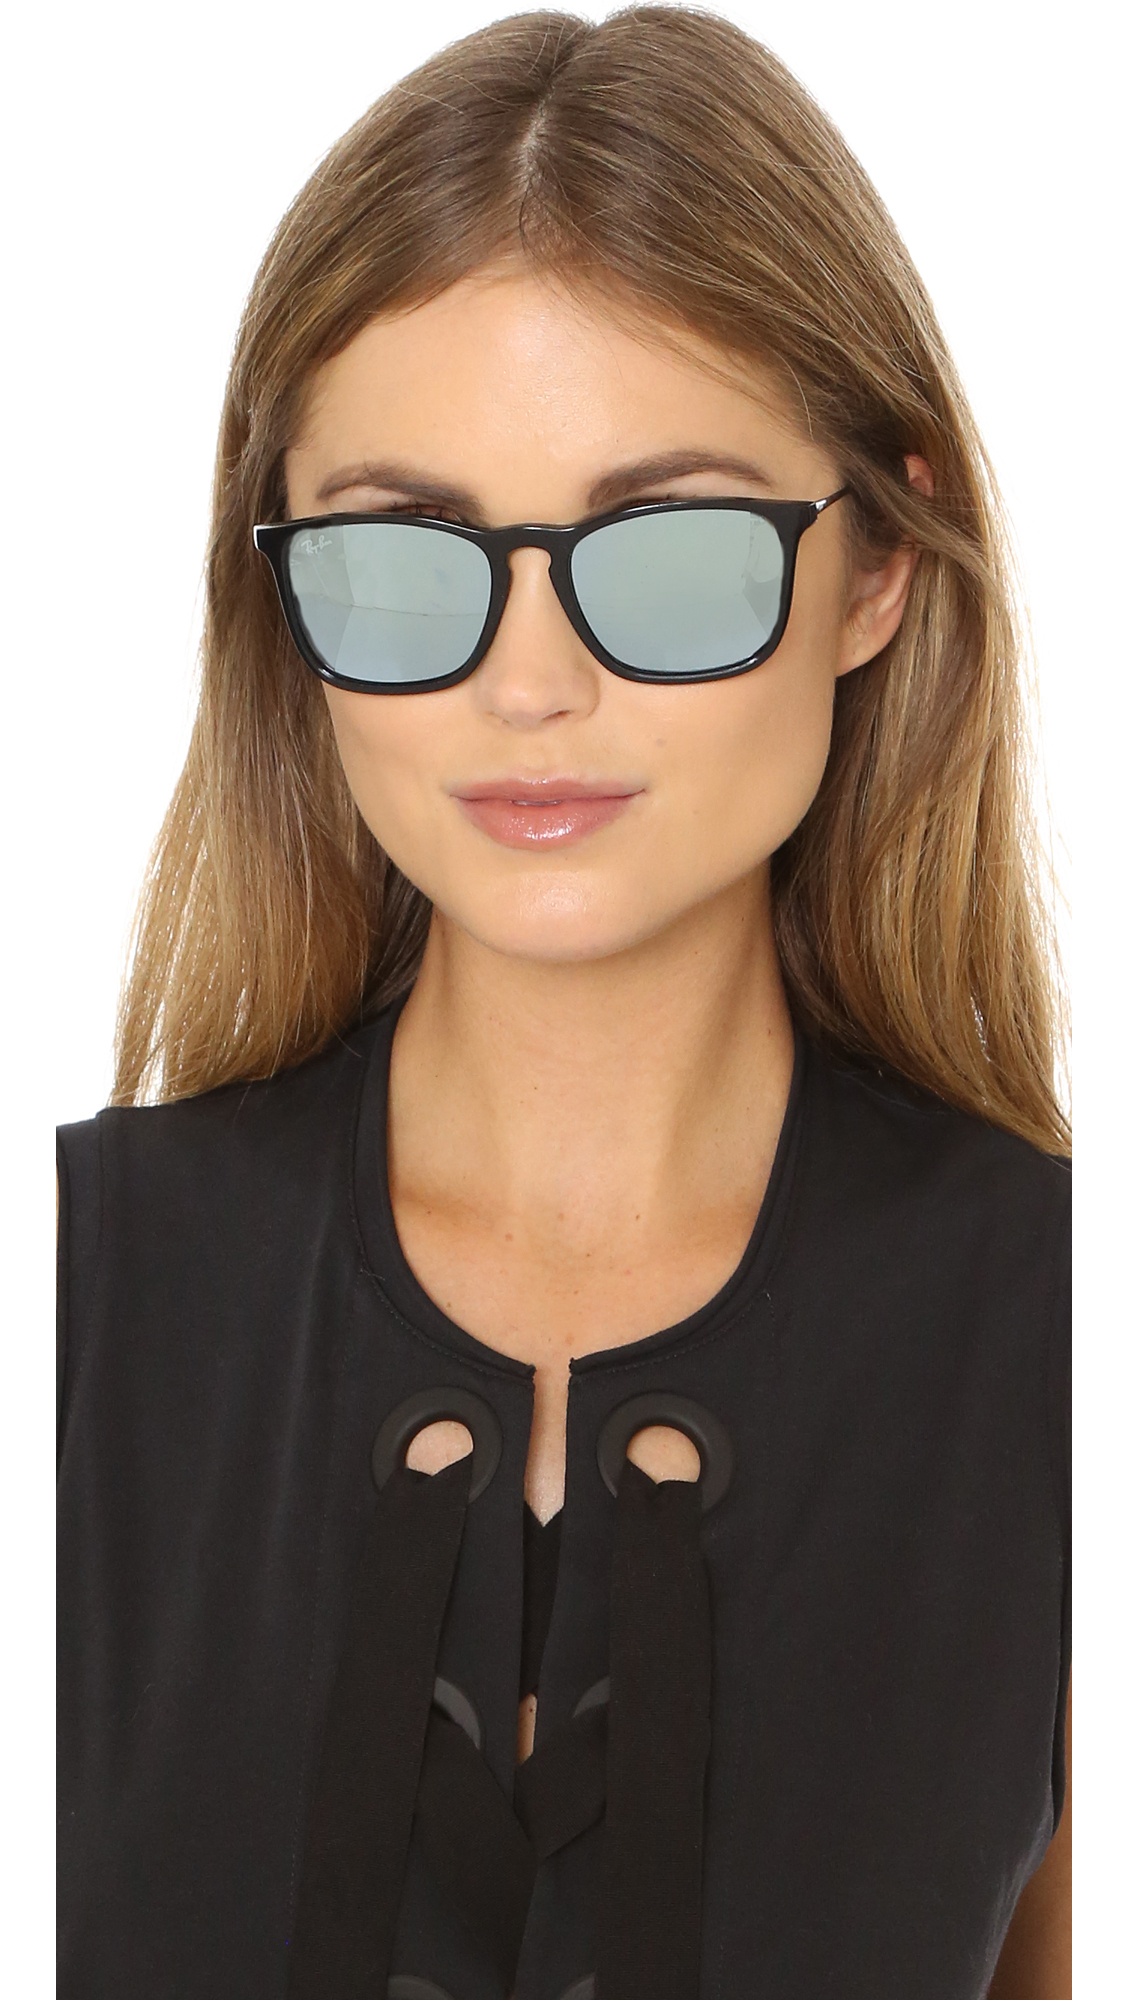 f306e2f1d6 Lyst - Ray-Ban Chris Sunglasses in Black